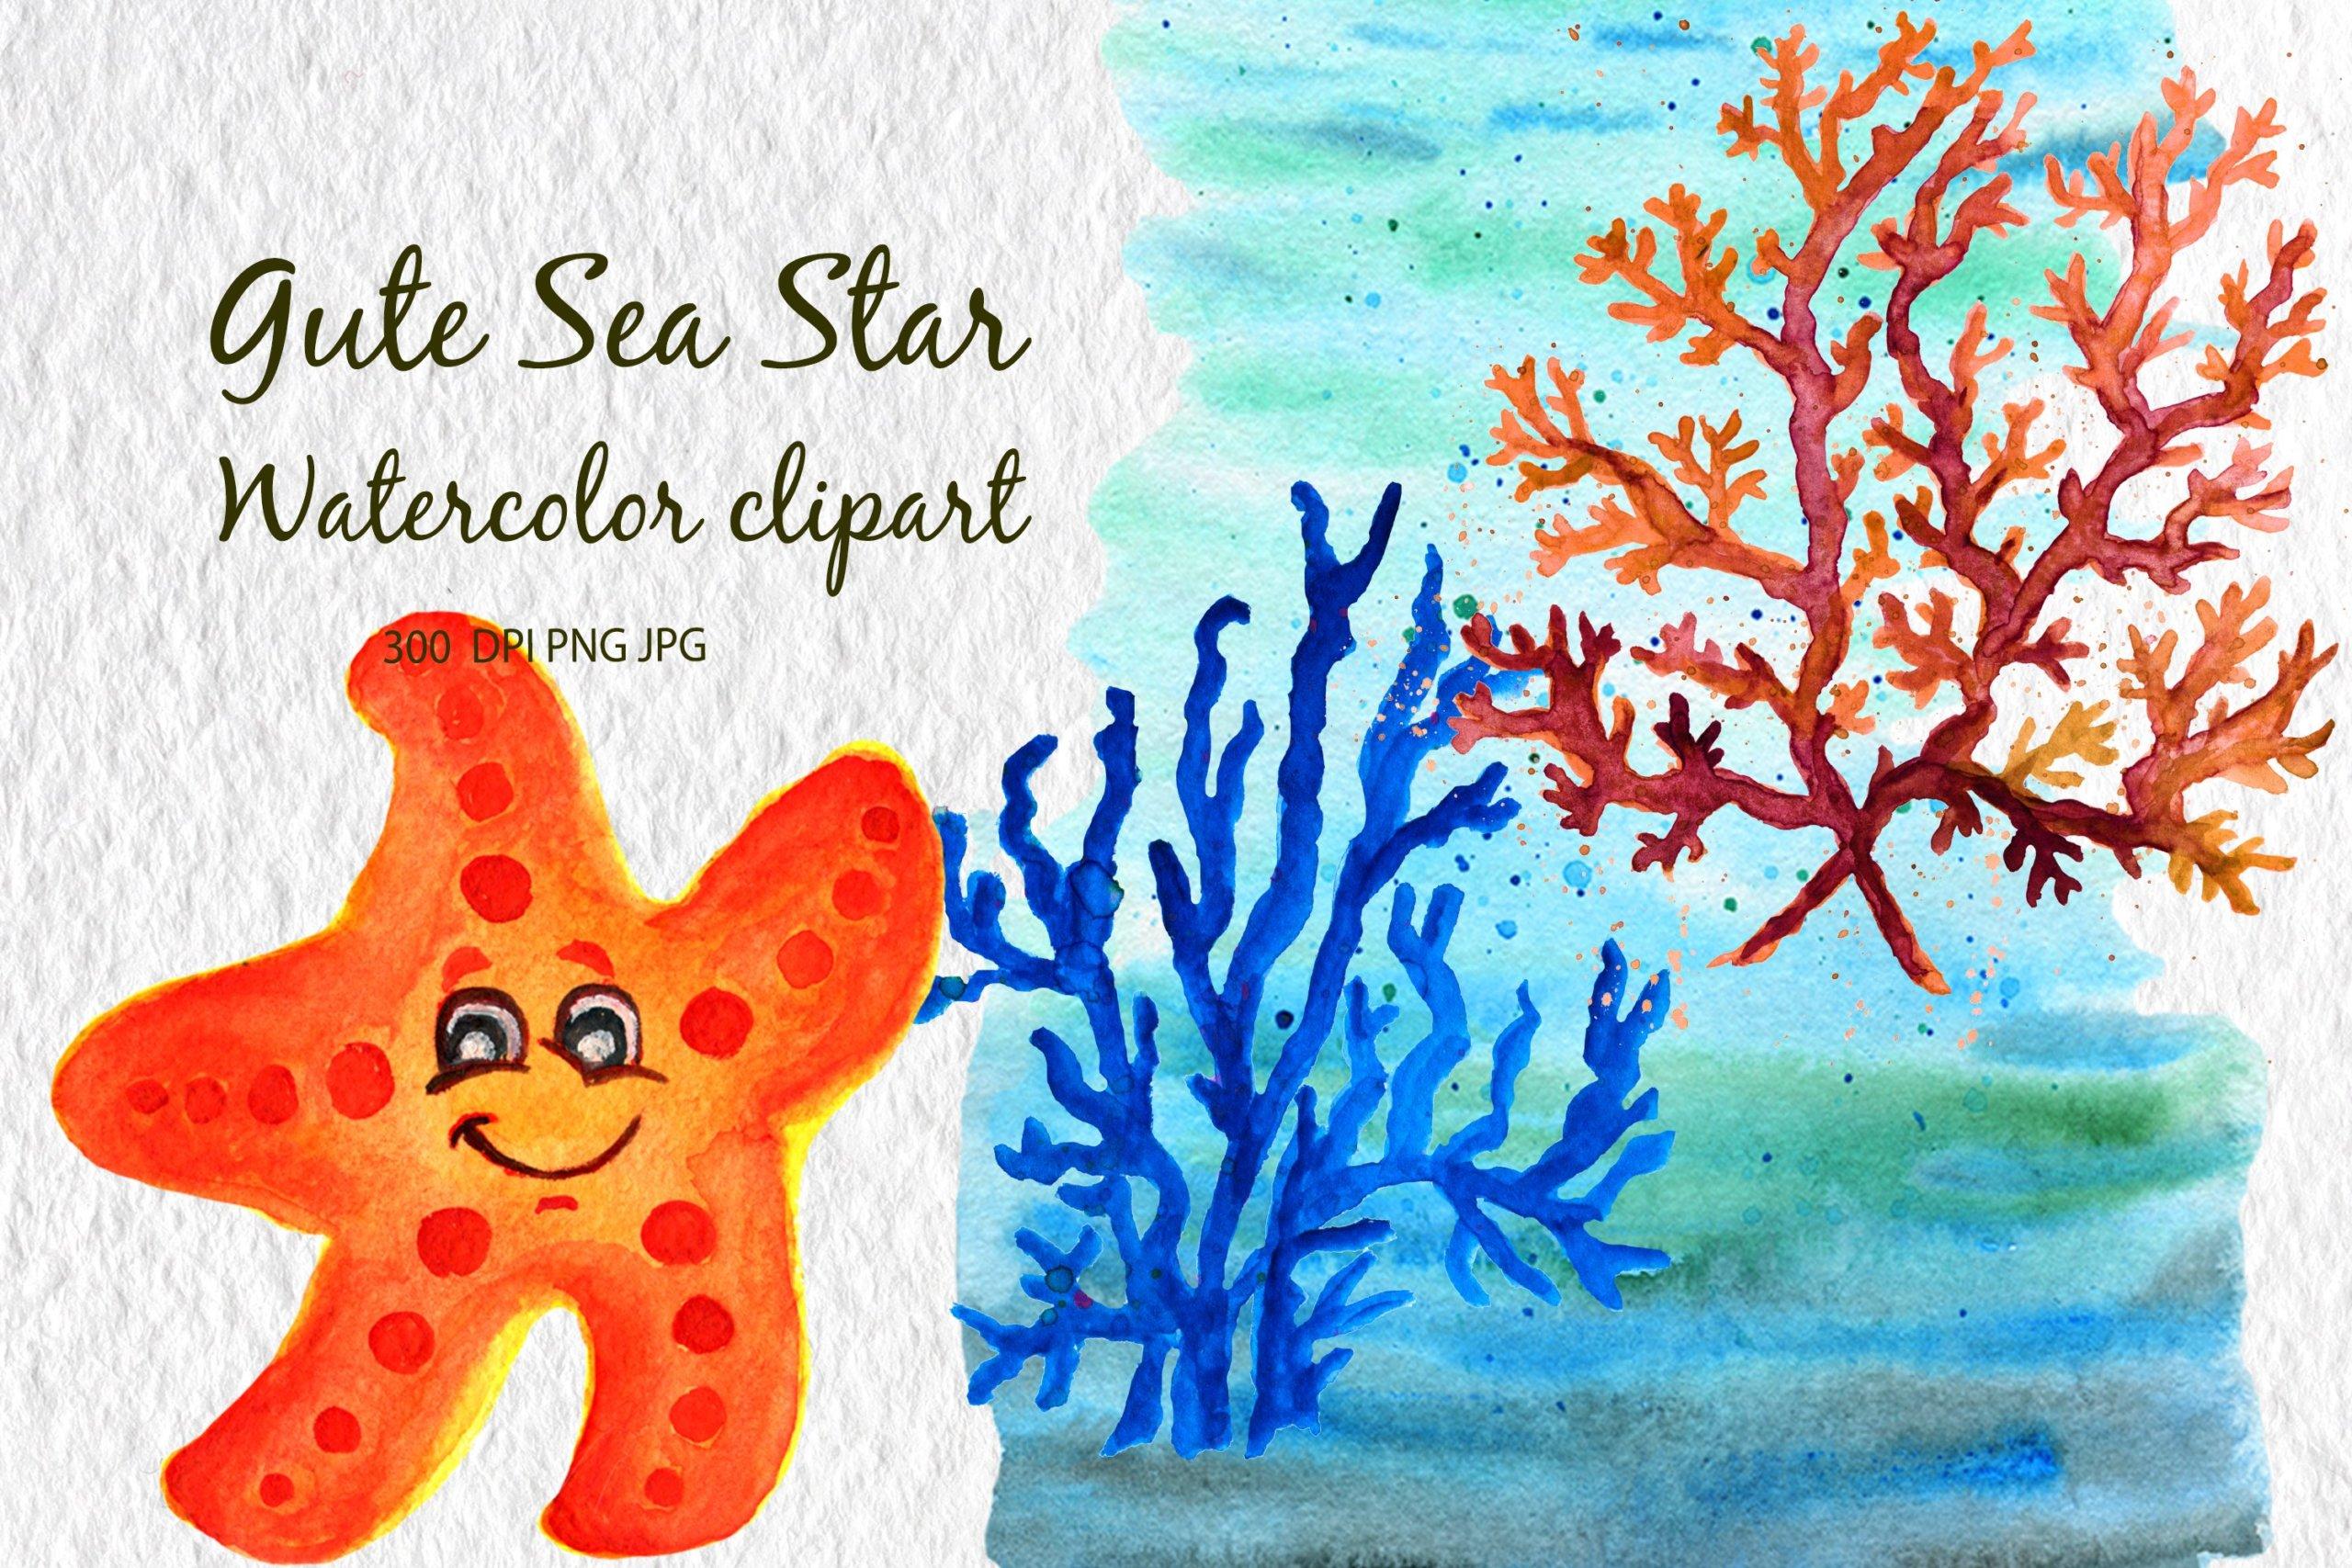 高清海底海星珊瑚手绘剪贴画PNG透明图片素材 Corals Clip Art for Kids Watercolor Sea插图2